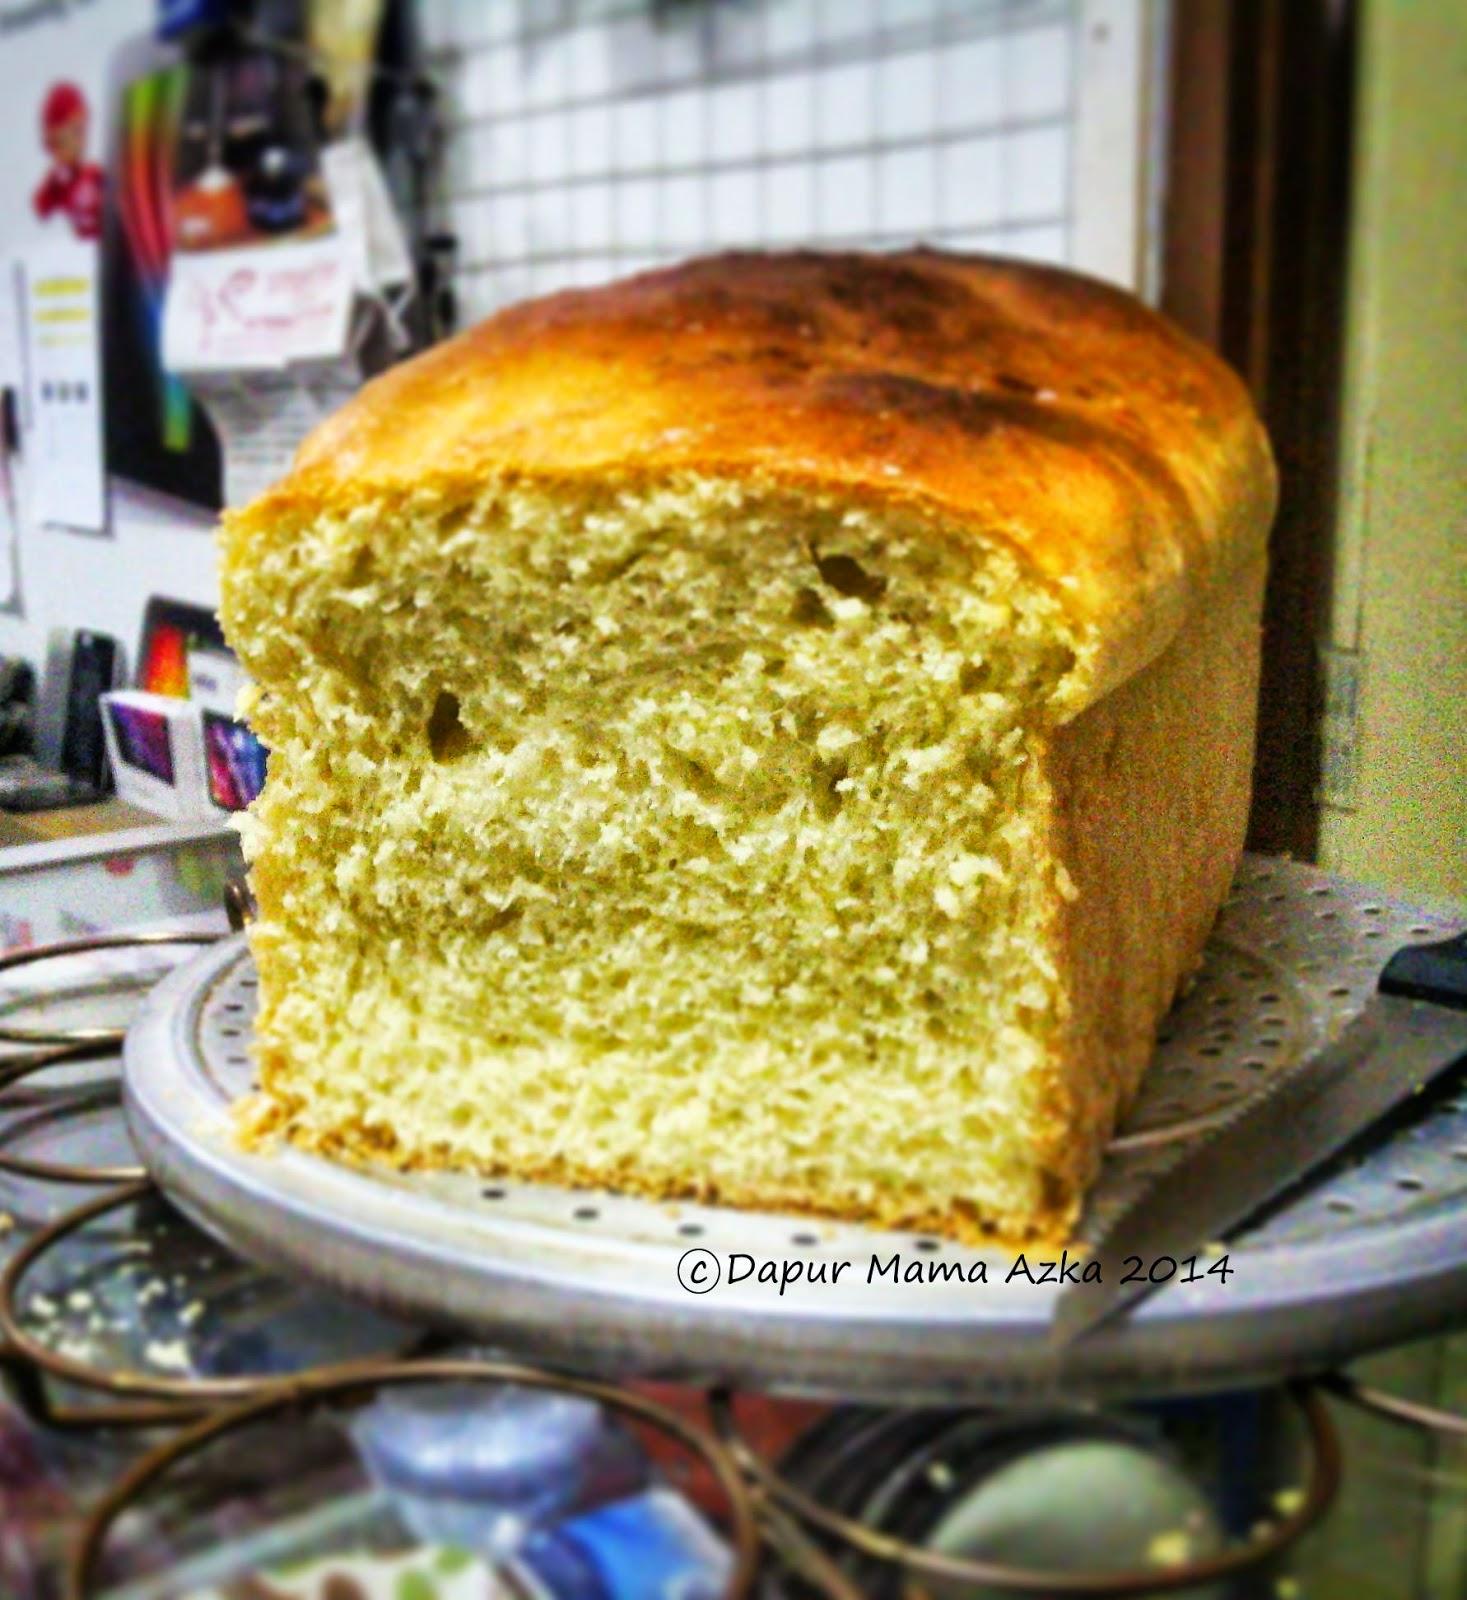 ... Resep masakan, kue dan roti sederhana dan mudah, kreasi Dapur Mama